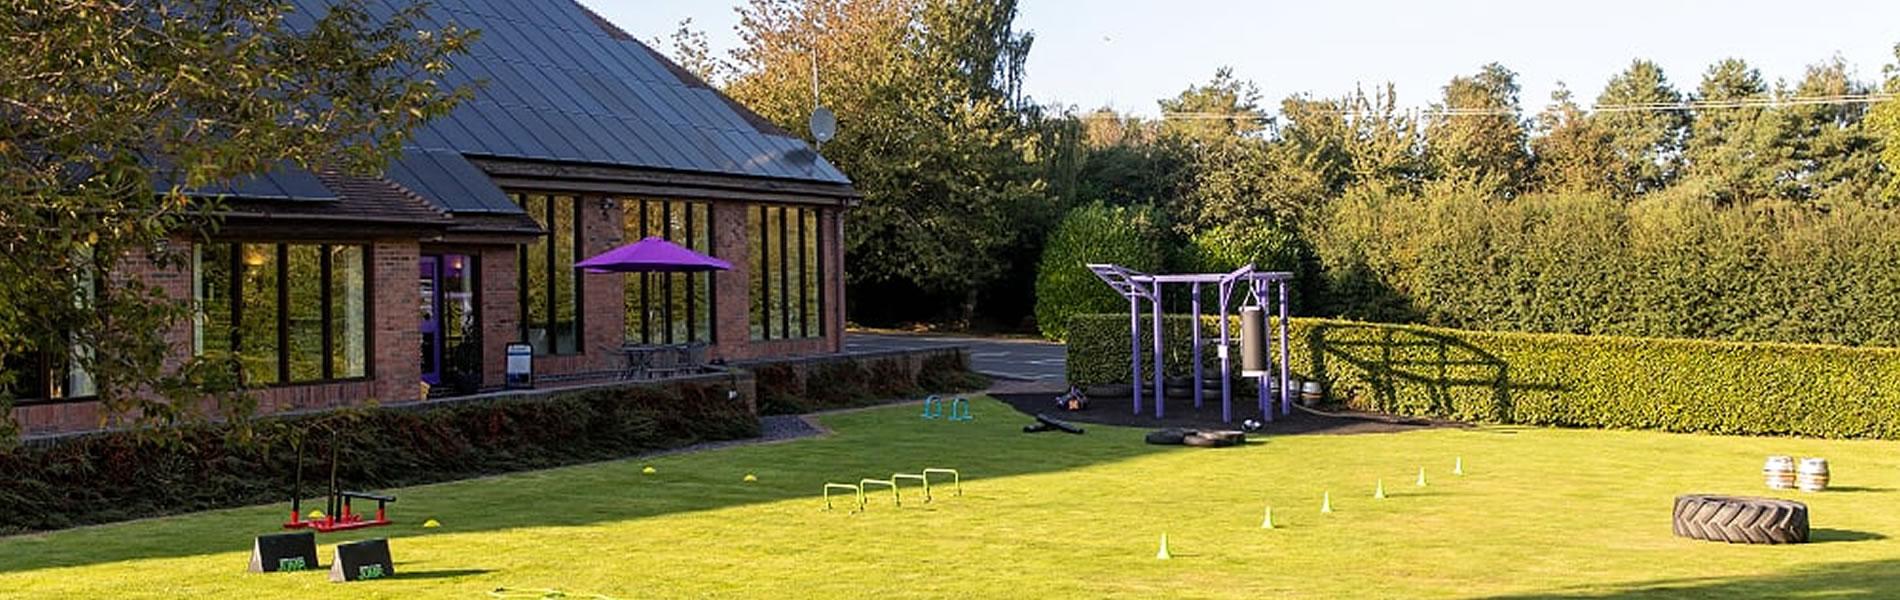 Breedon Priory Health Club - Contact Us